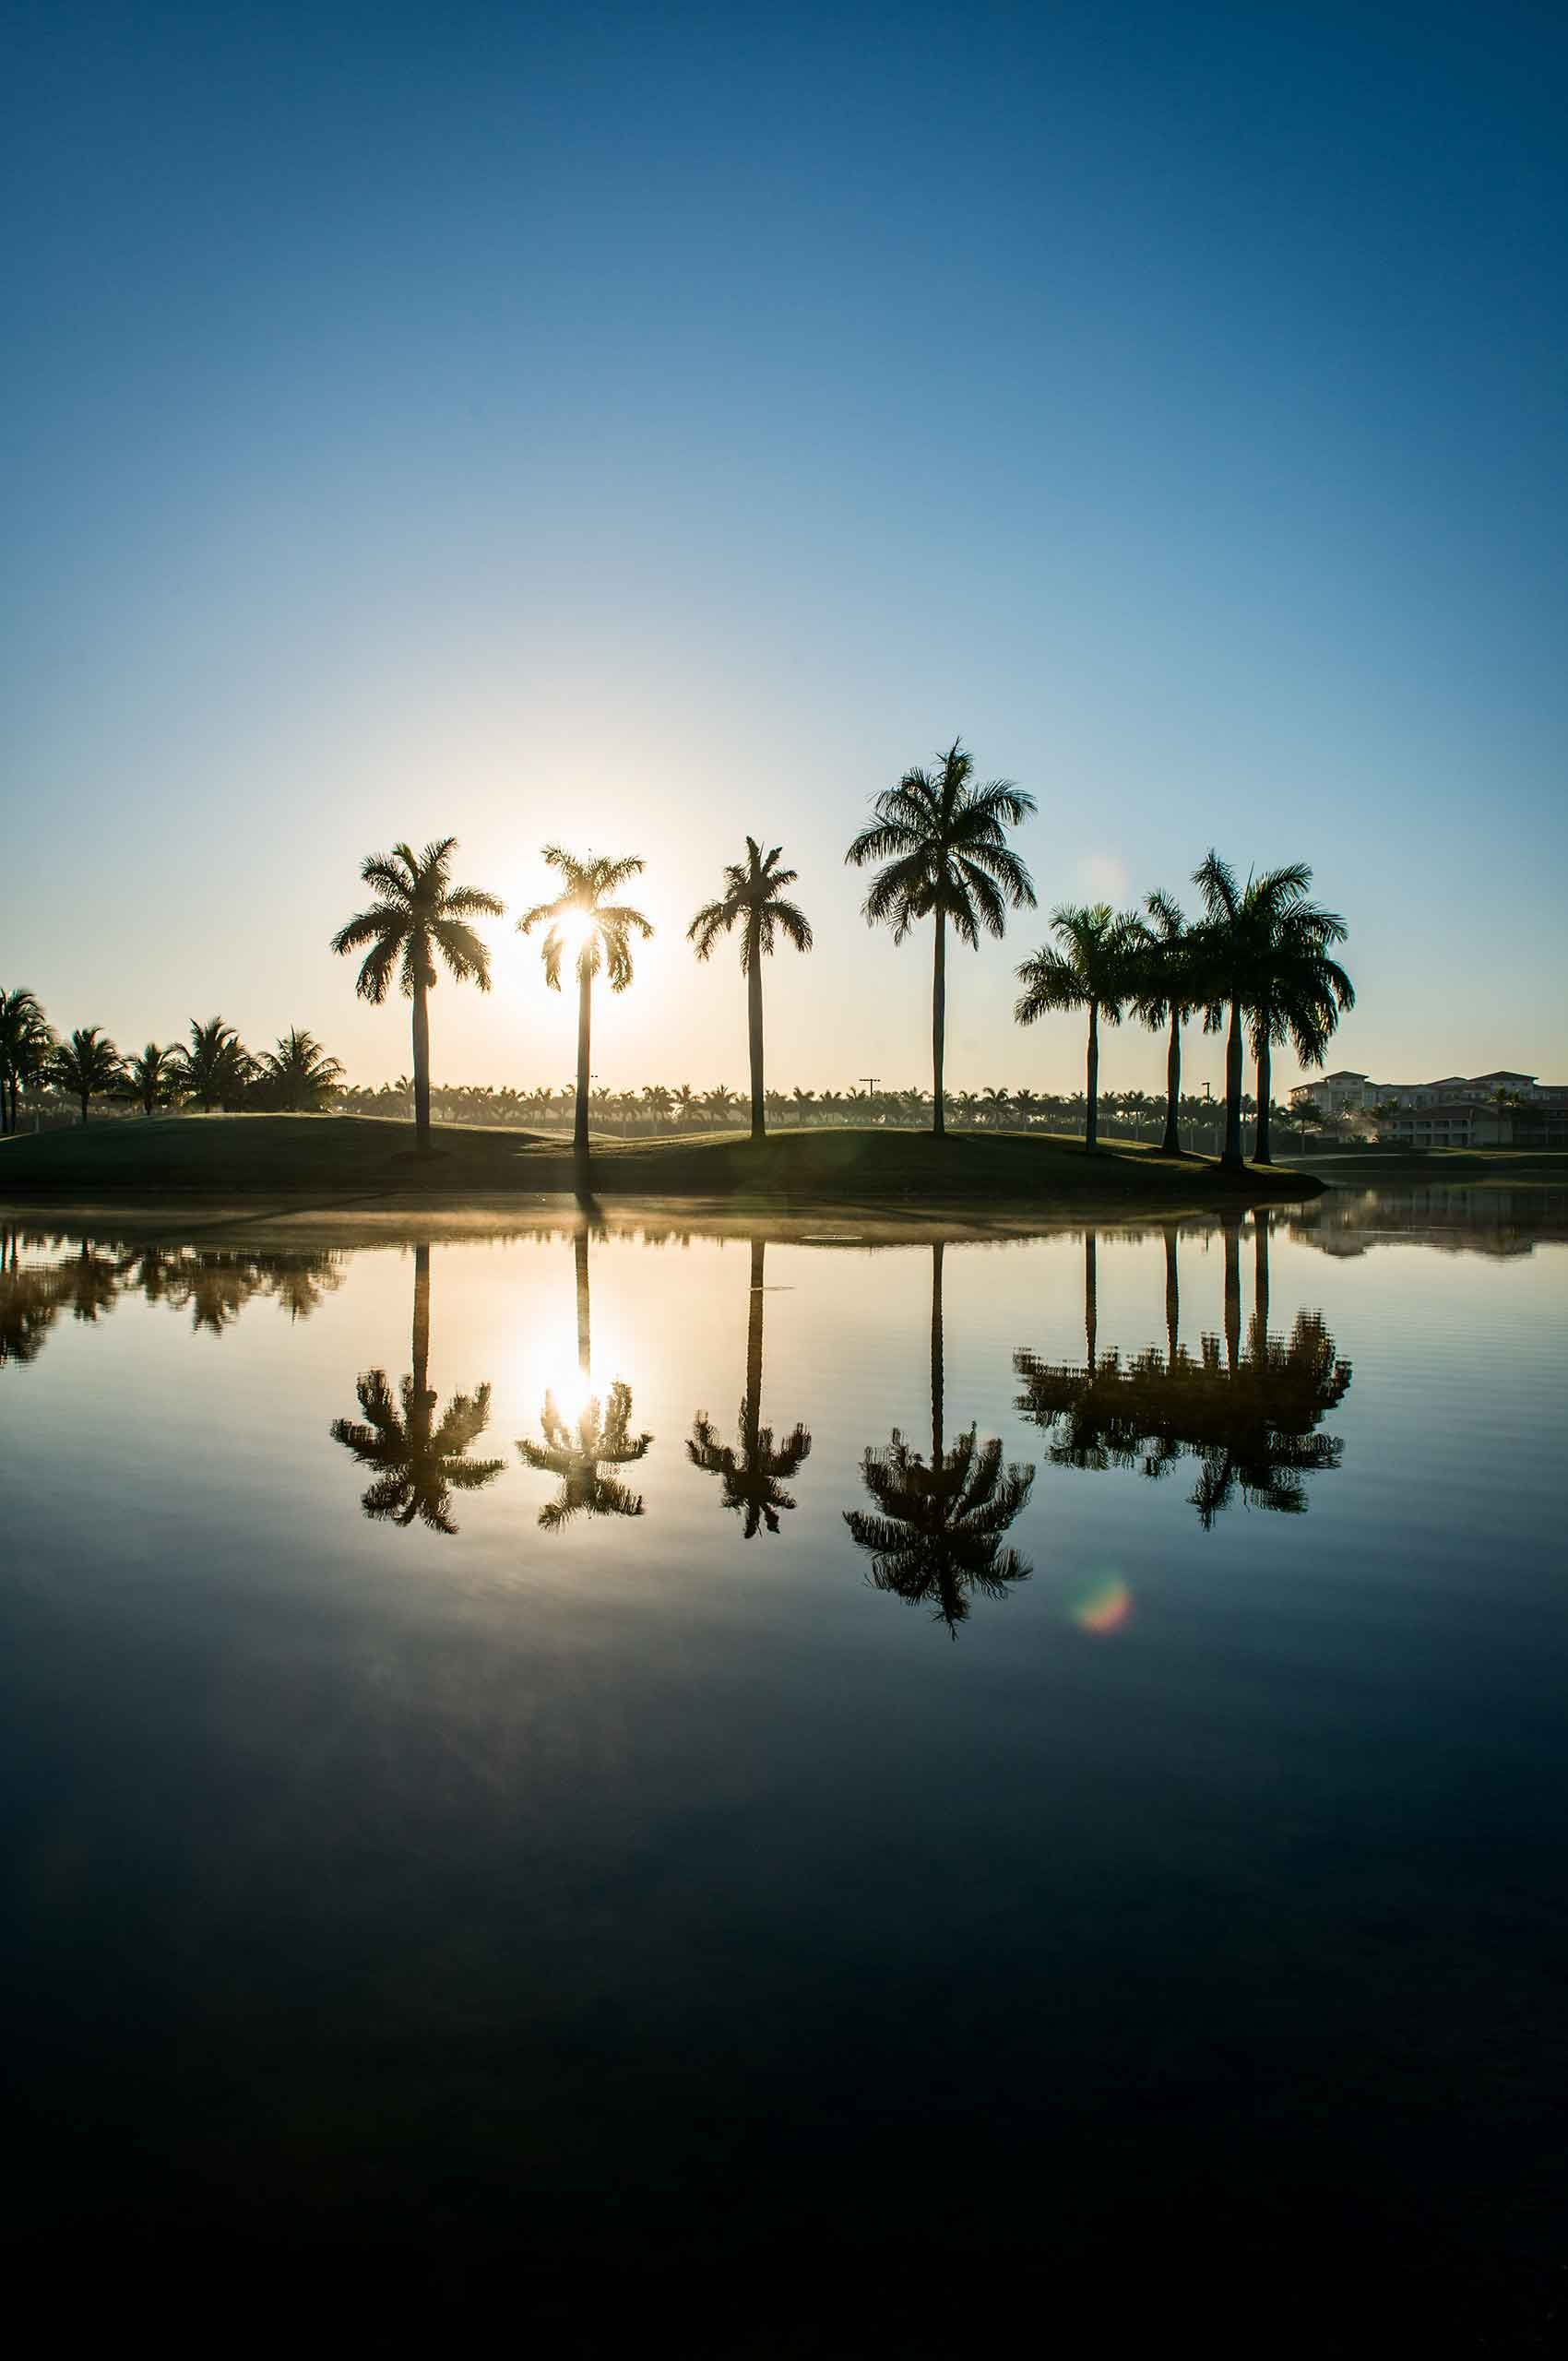 Palmtrees-reflection-in-water-by-HenrikOlundPhotography..jpg